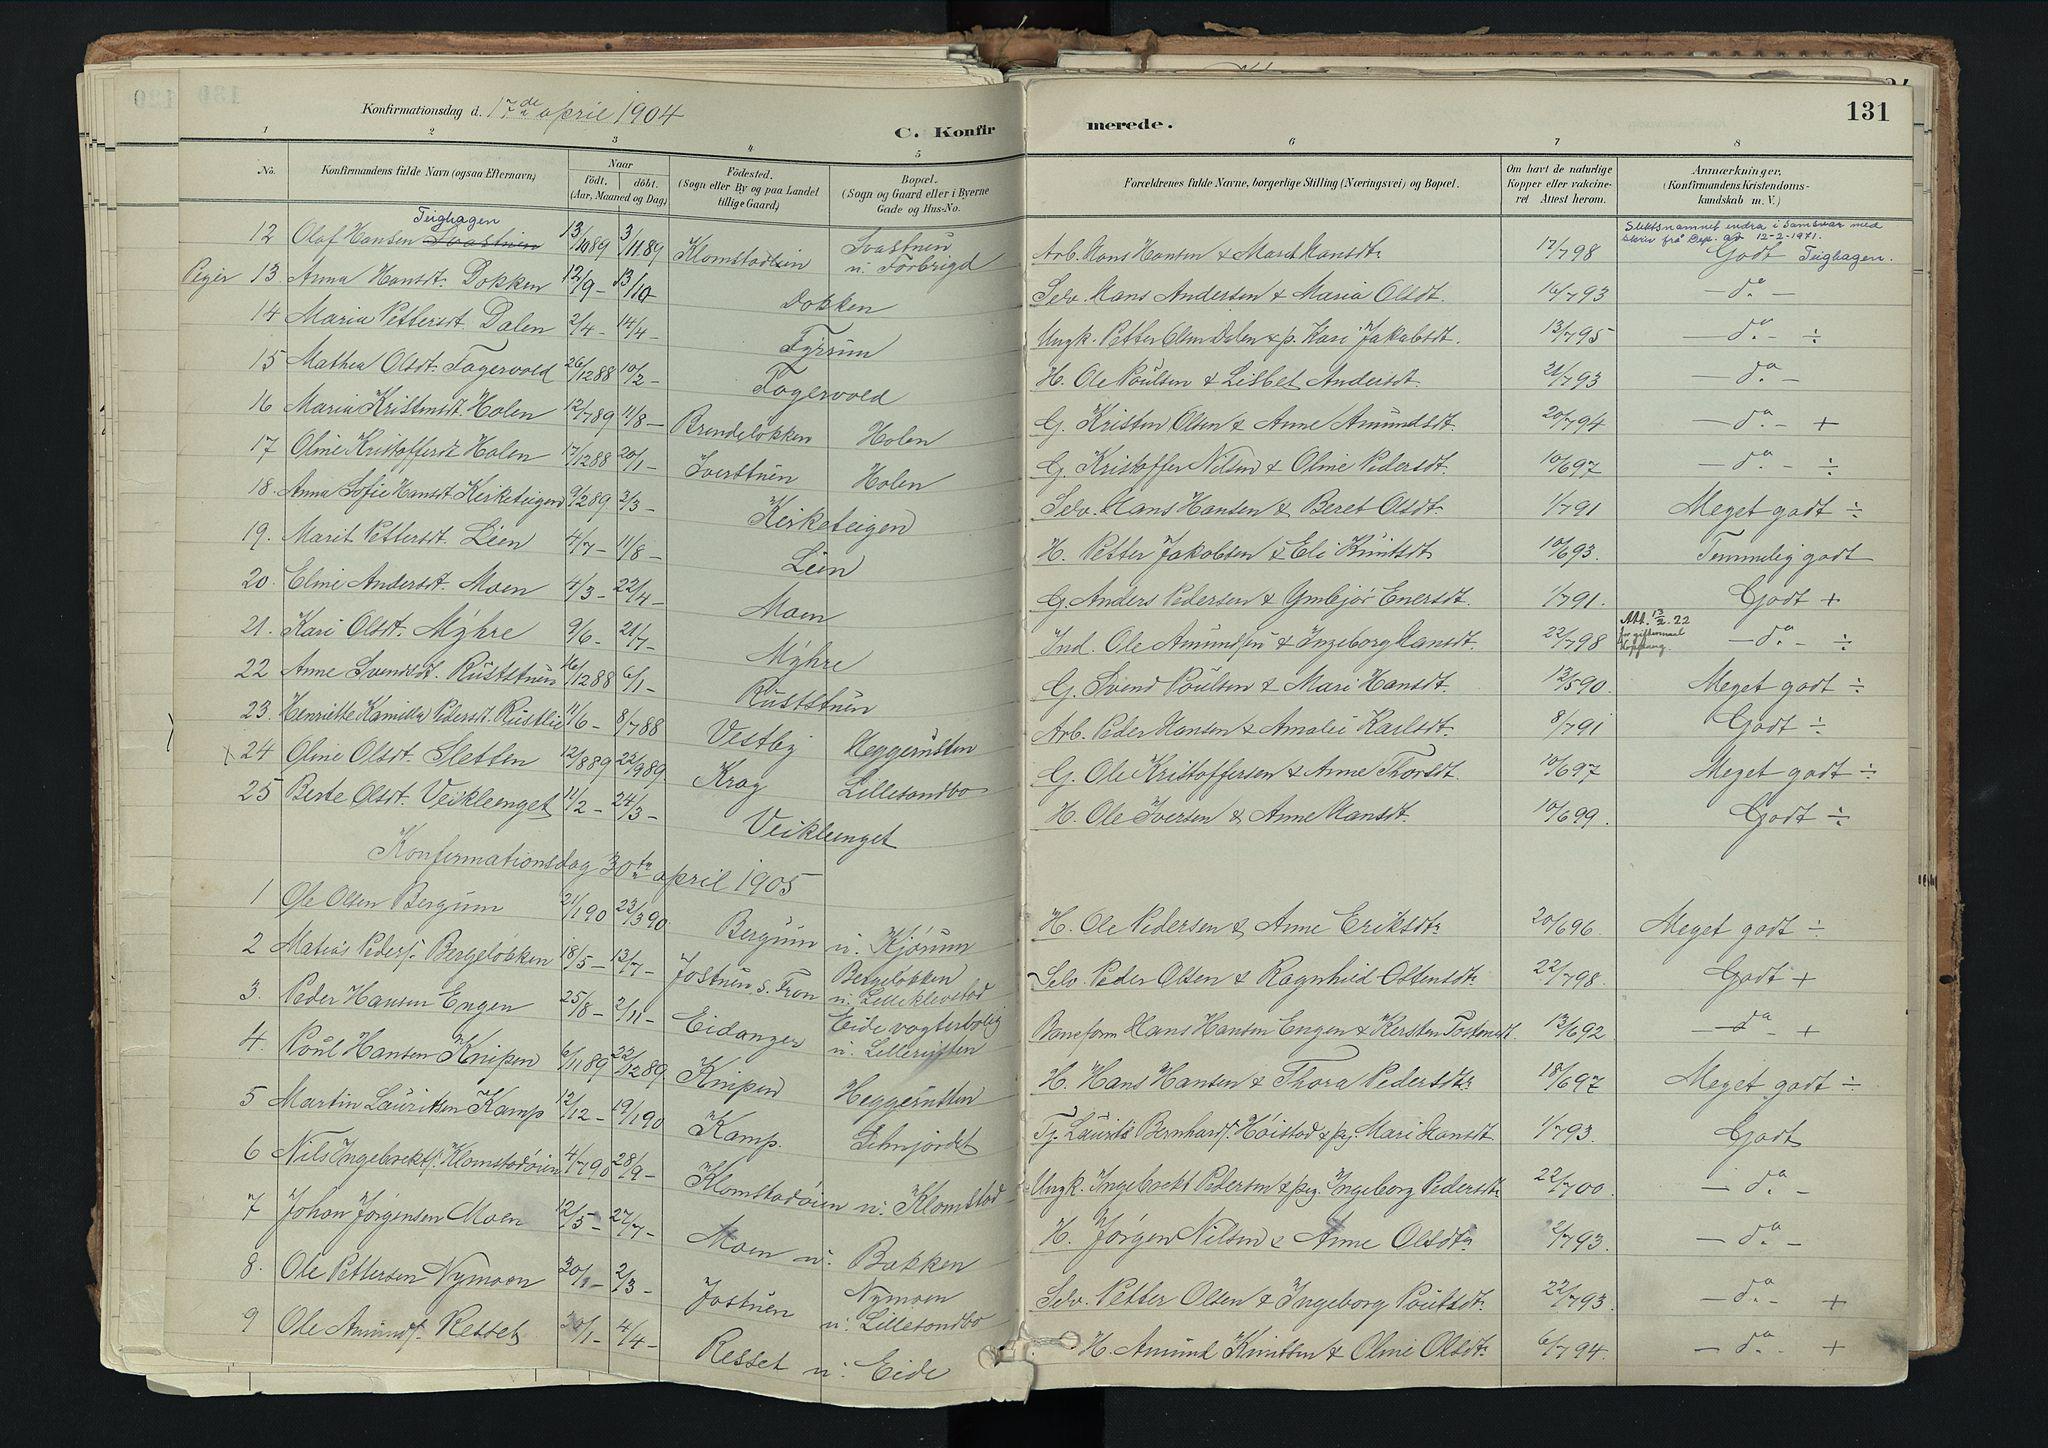 SAH, Nord-Fron prestekontor, Ministerialbok nr. 3, 1884-1914, s. 131